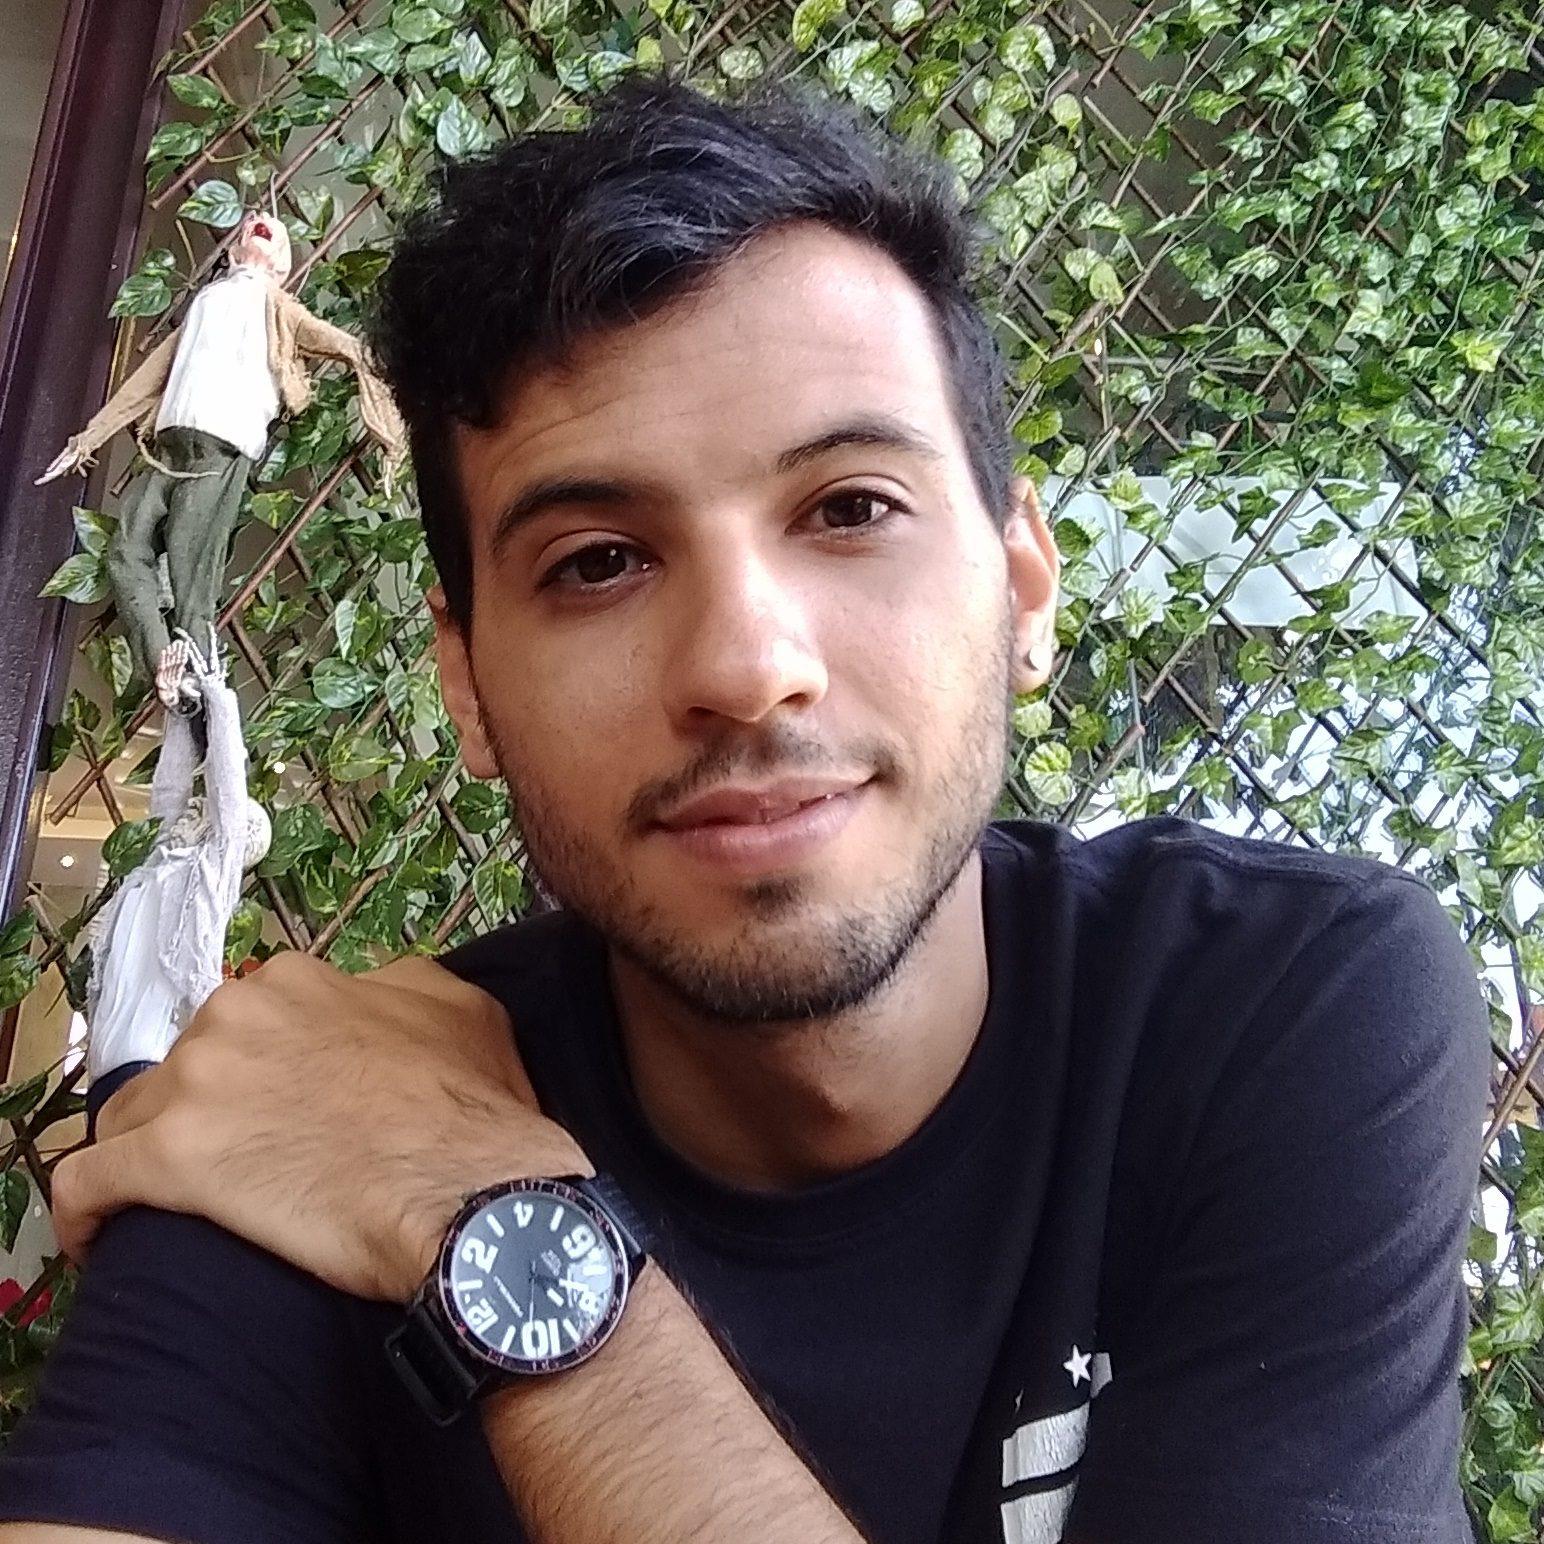 Felipe Glauber